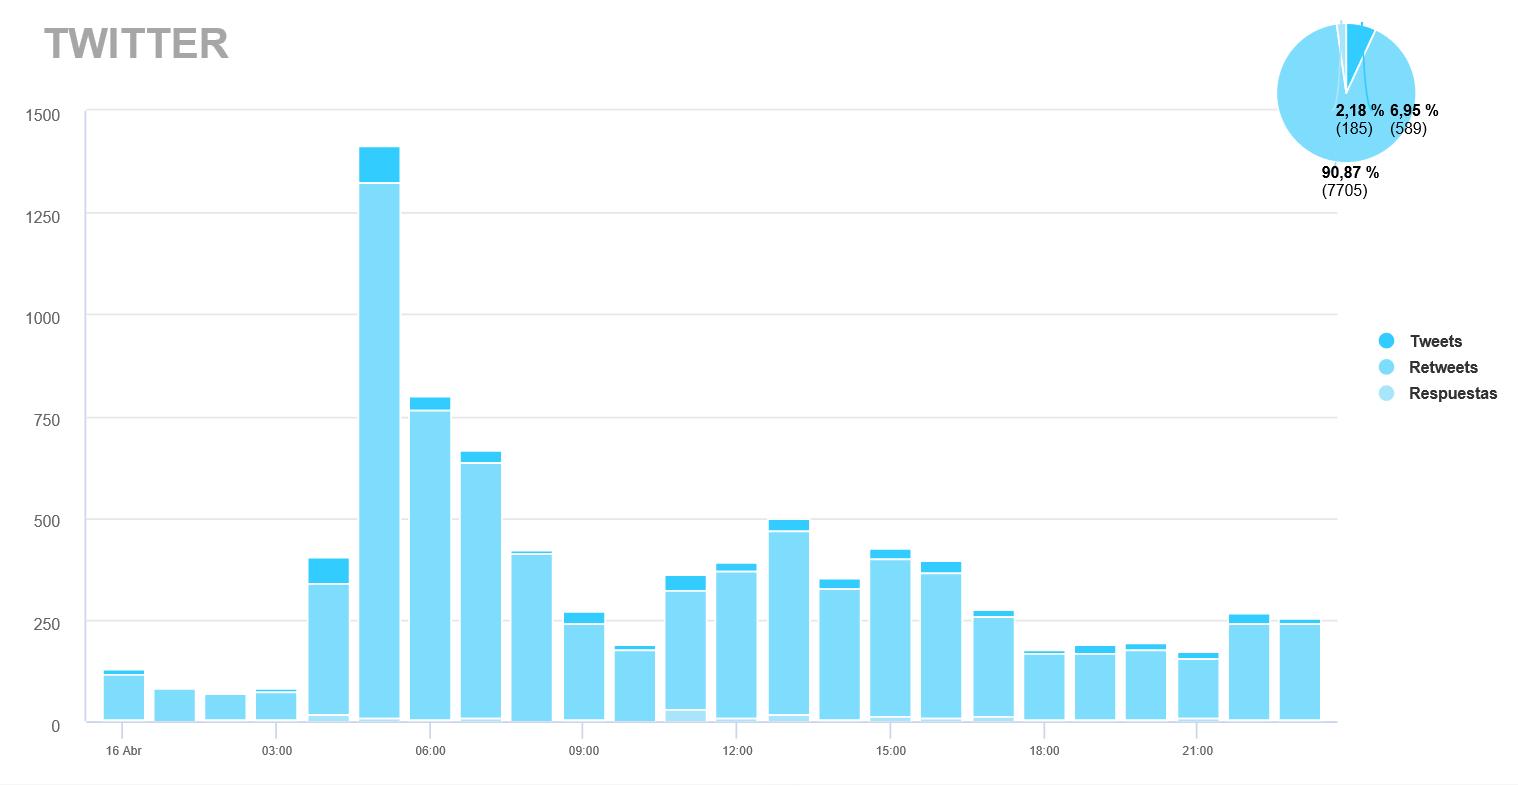 Engagement generado por Twitter